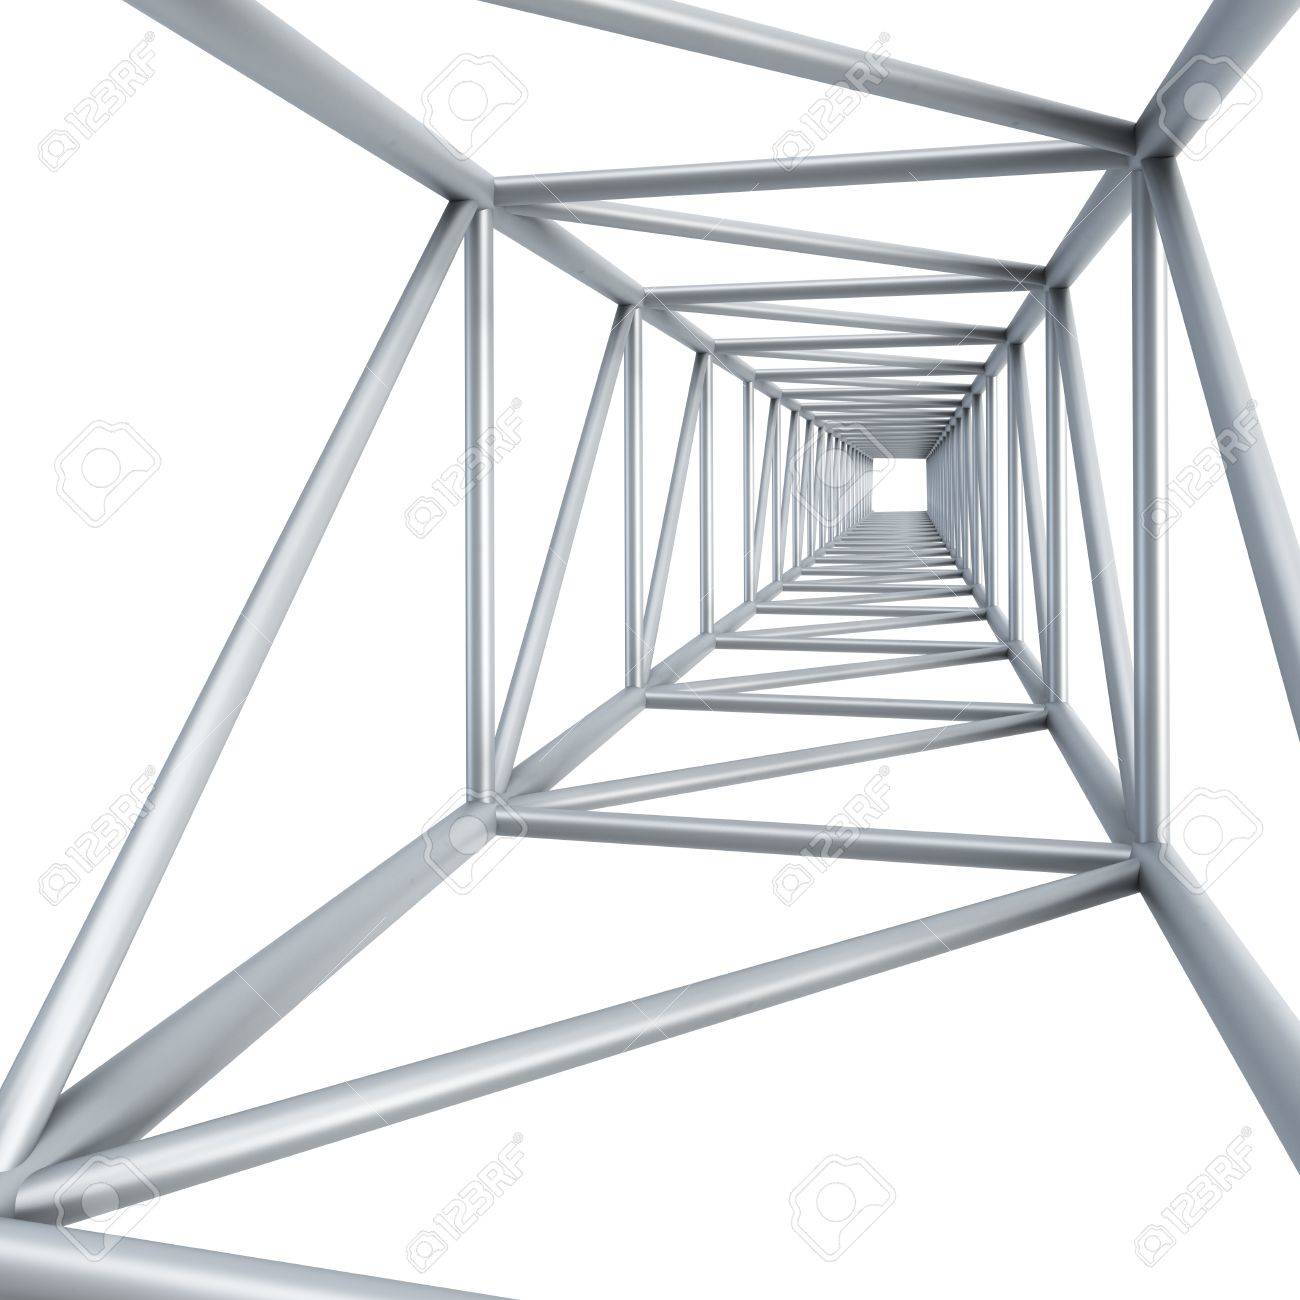 steel girder, isolated 3d render Stock Photo - 13765583